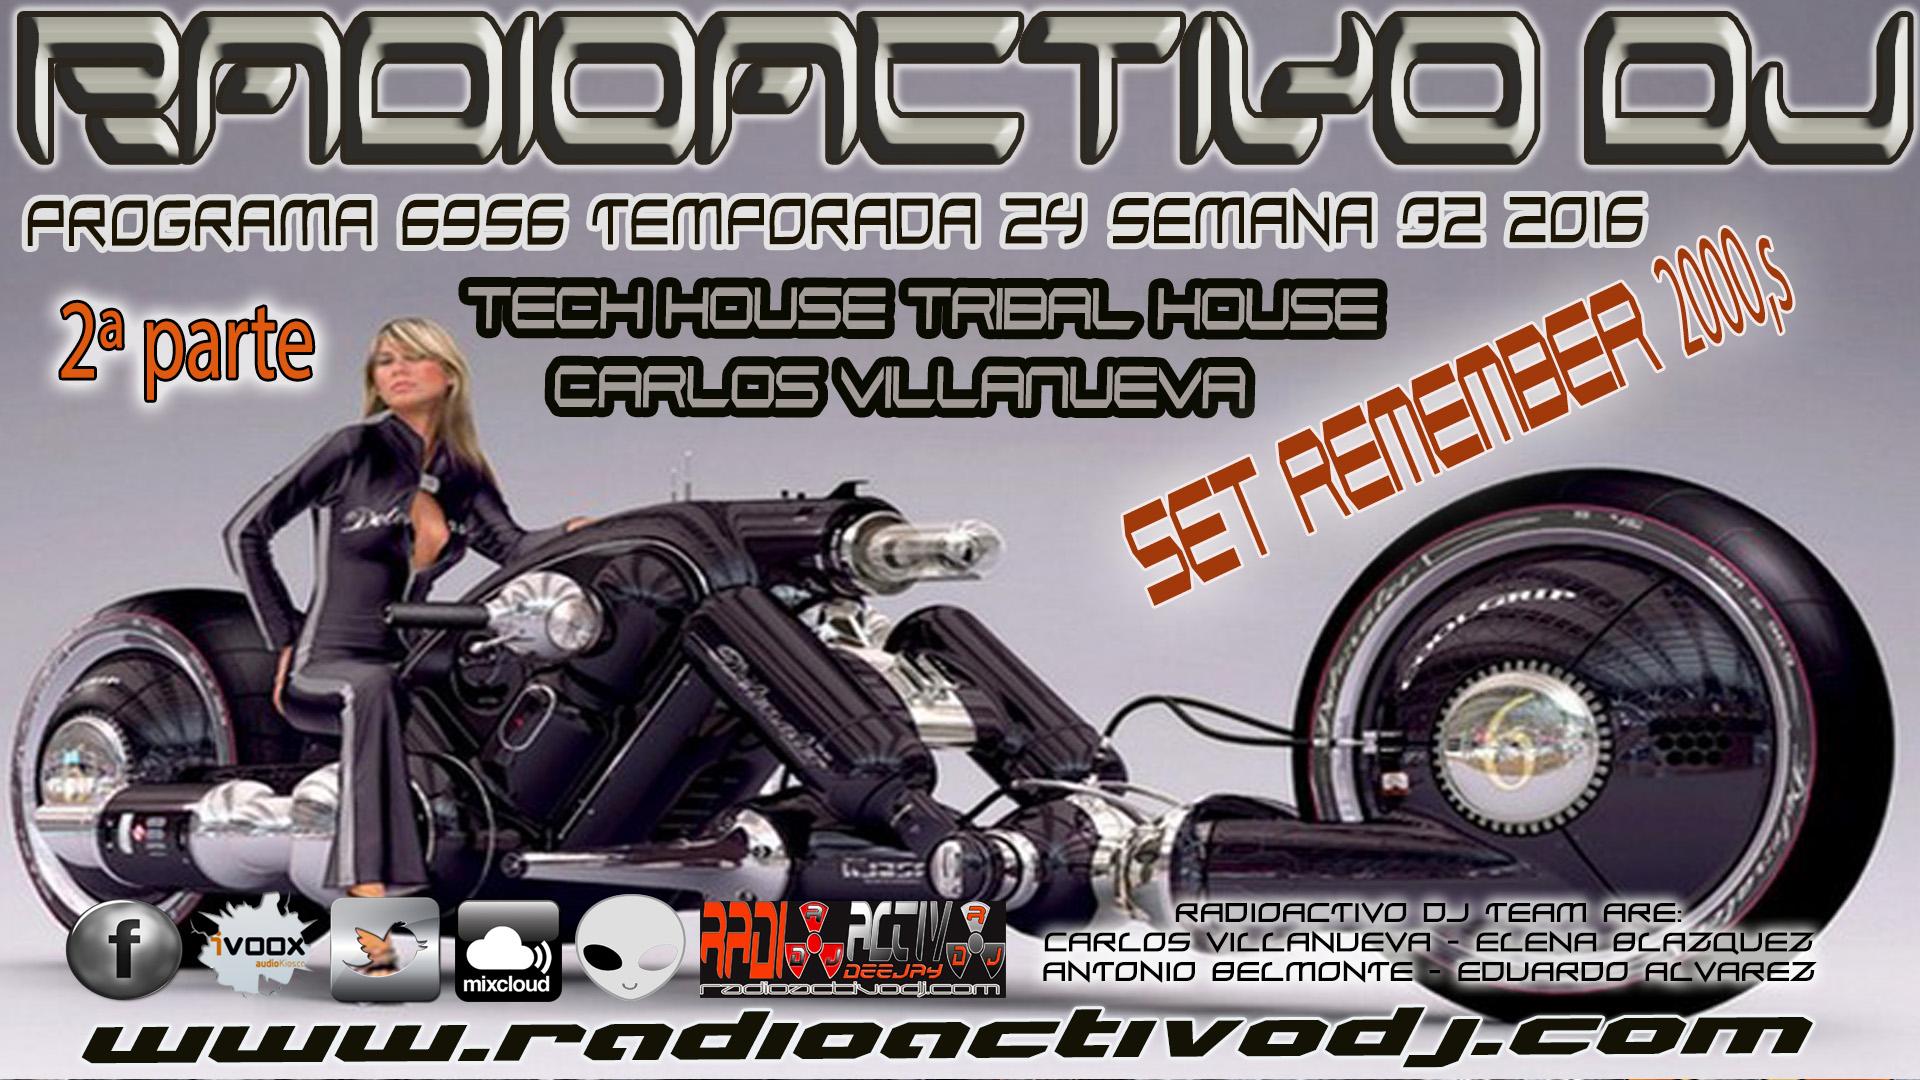 RADIOACTIVO DJ 32--2016